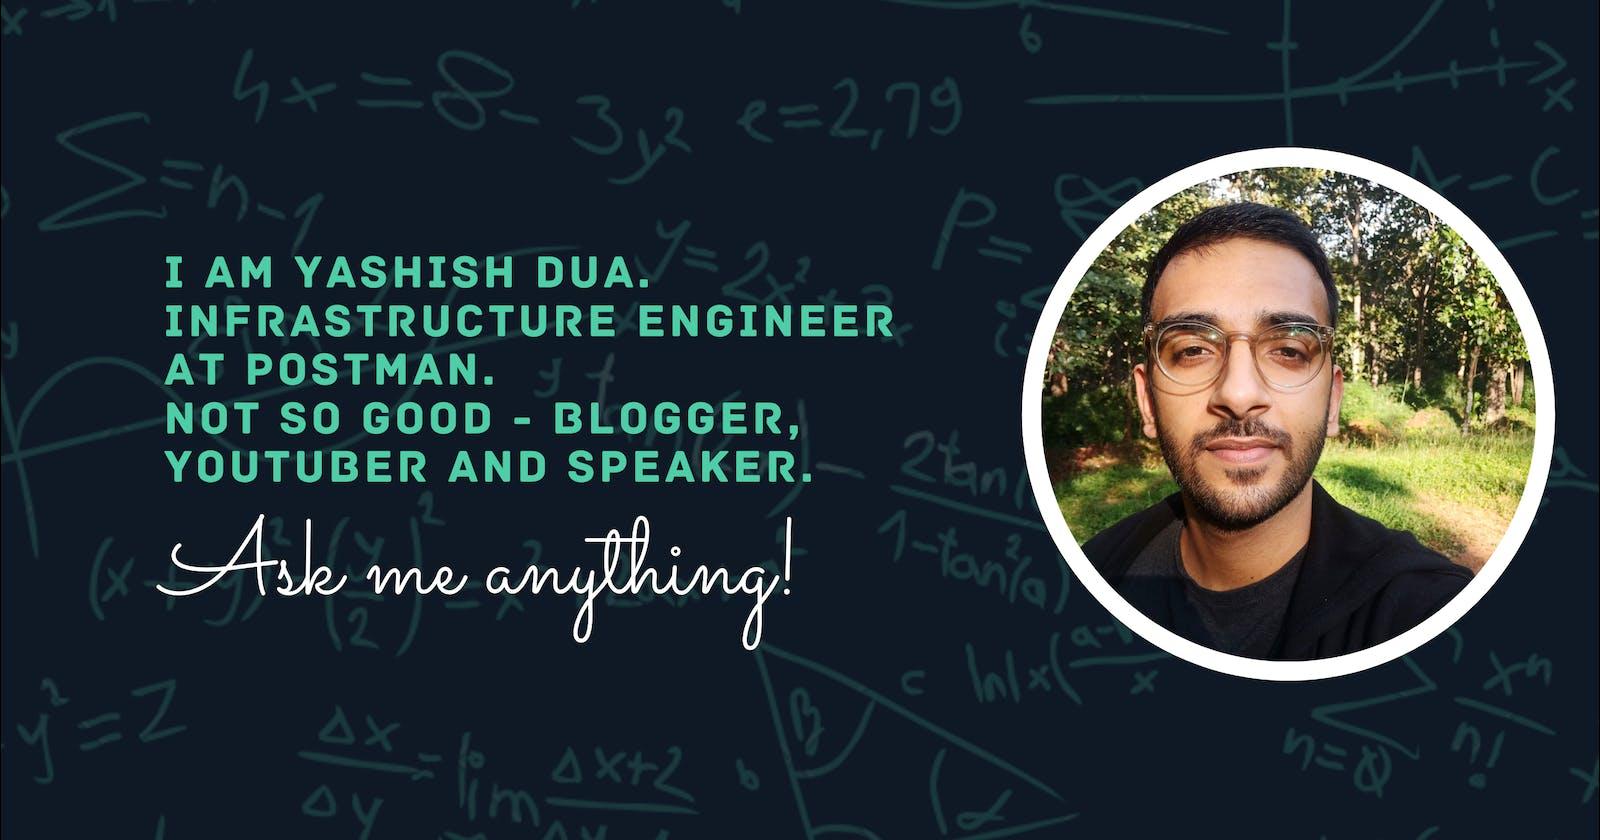 I'm Yashish Dua, an Infrastructure Engineer at Postman. Ask me anything! 👋